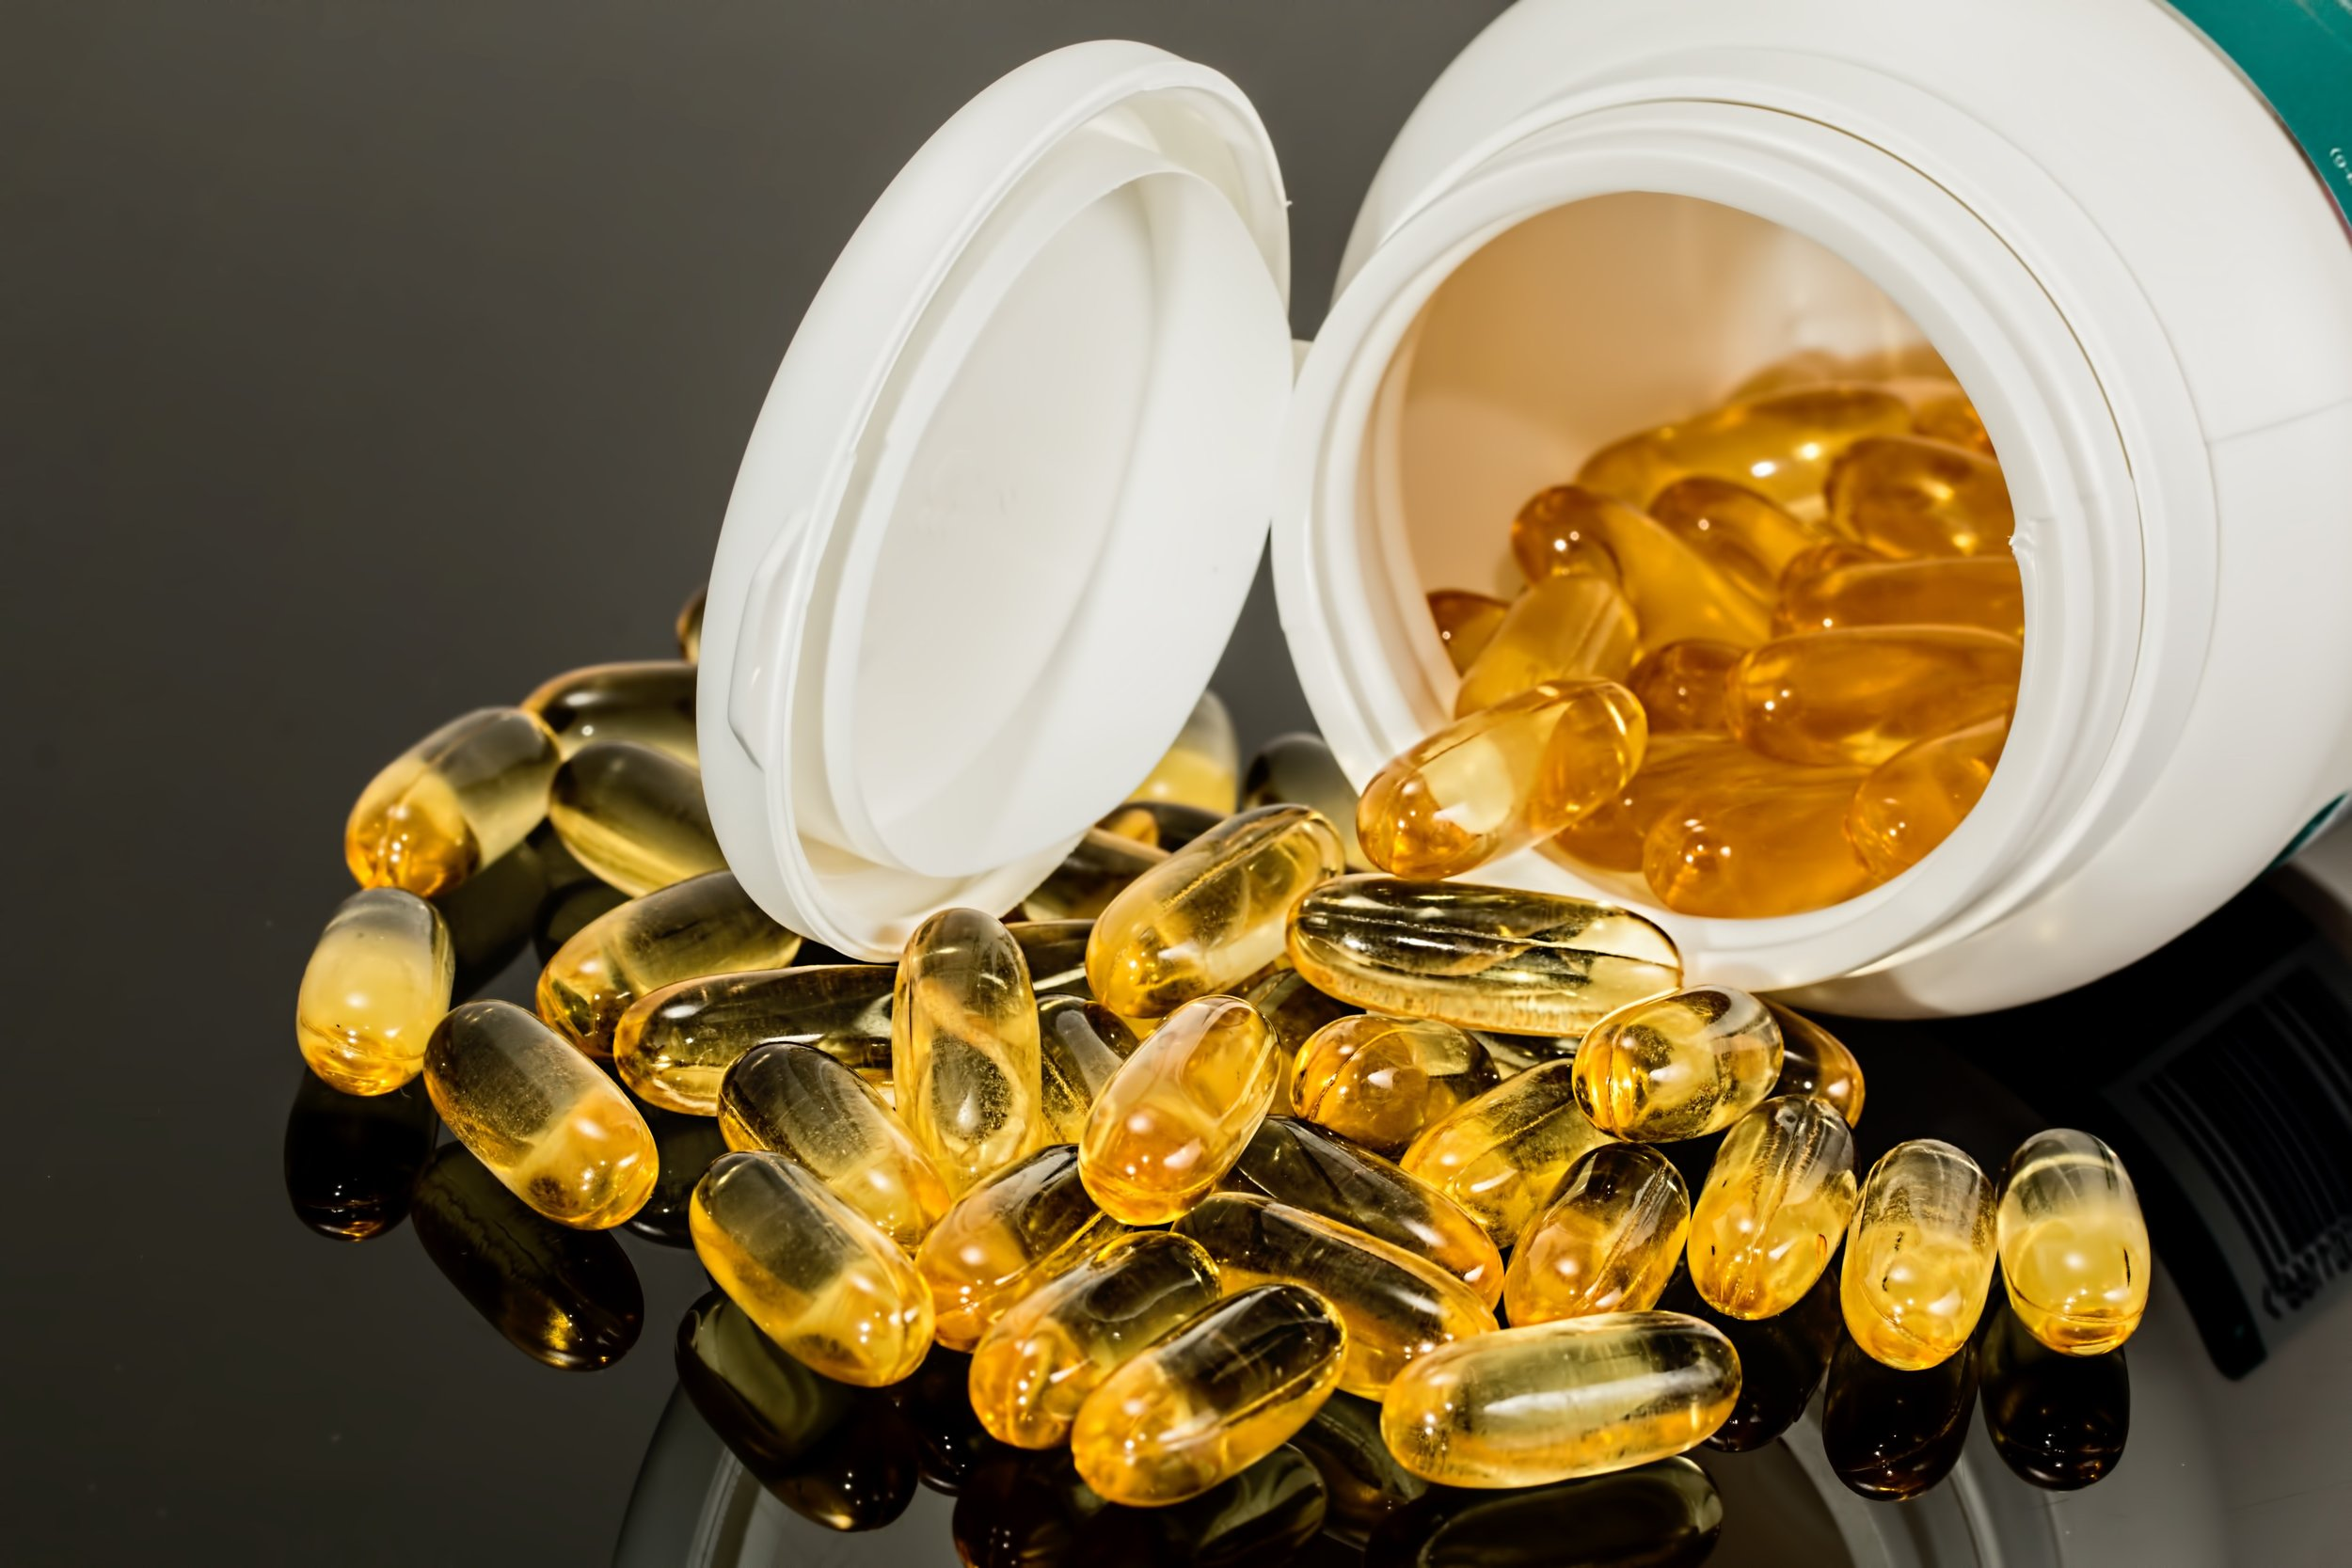 Nutritional Supplements  Such as melatonin, myo-inositol, & more.